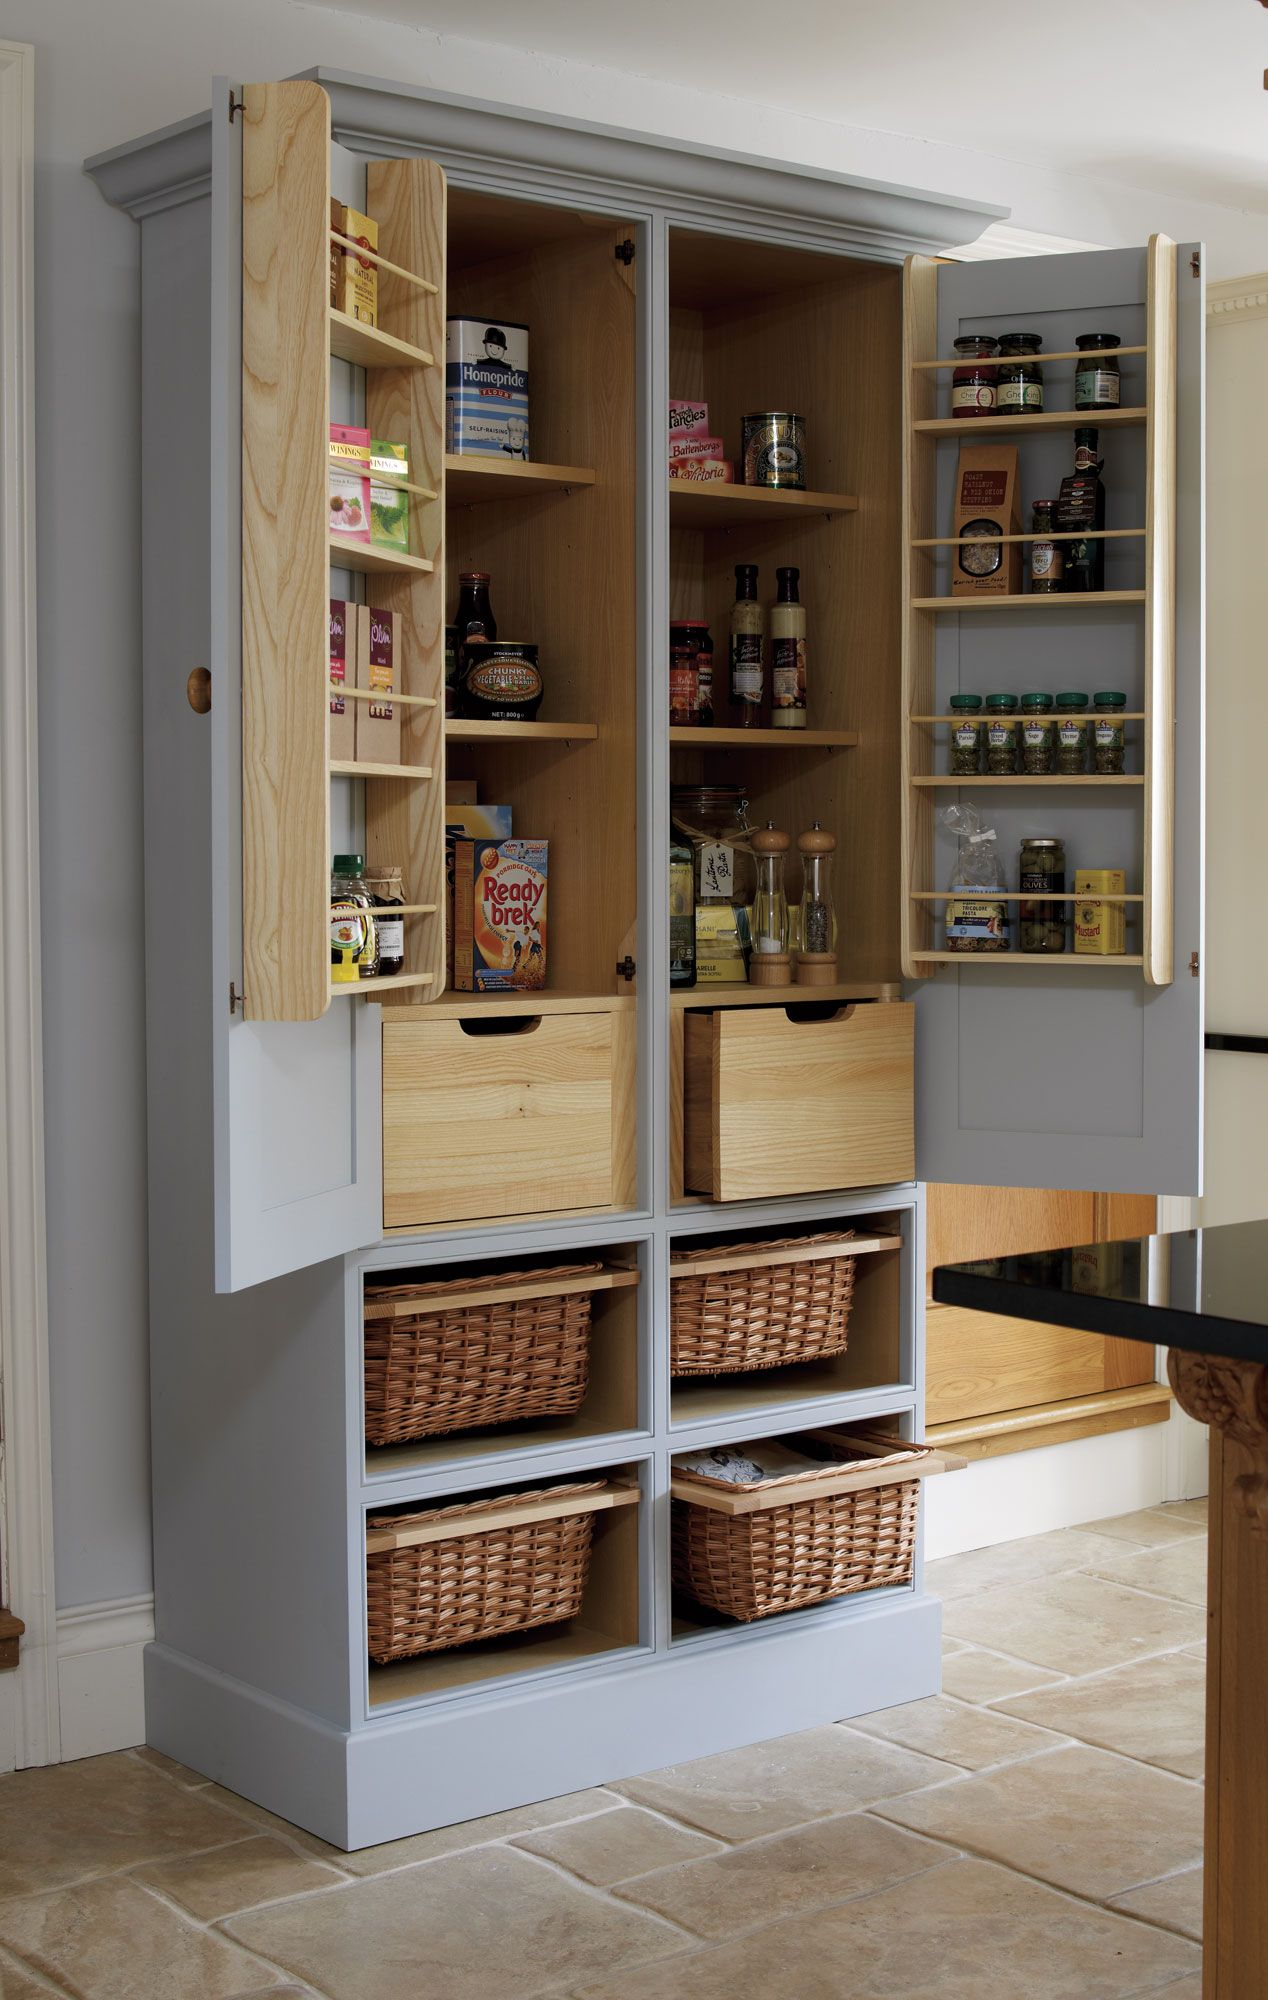 kitchen pantry cupboard ranges 14 organization ideas house projects larder